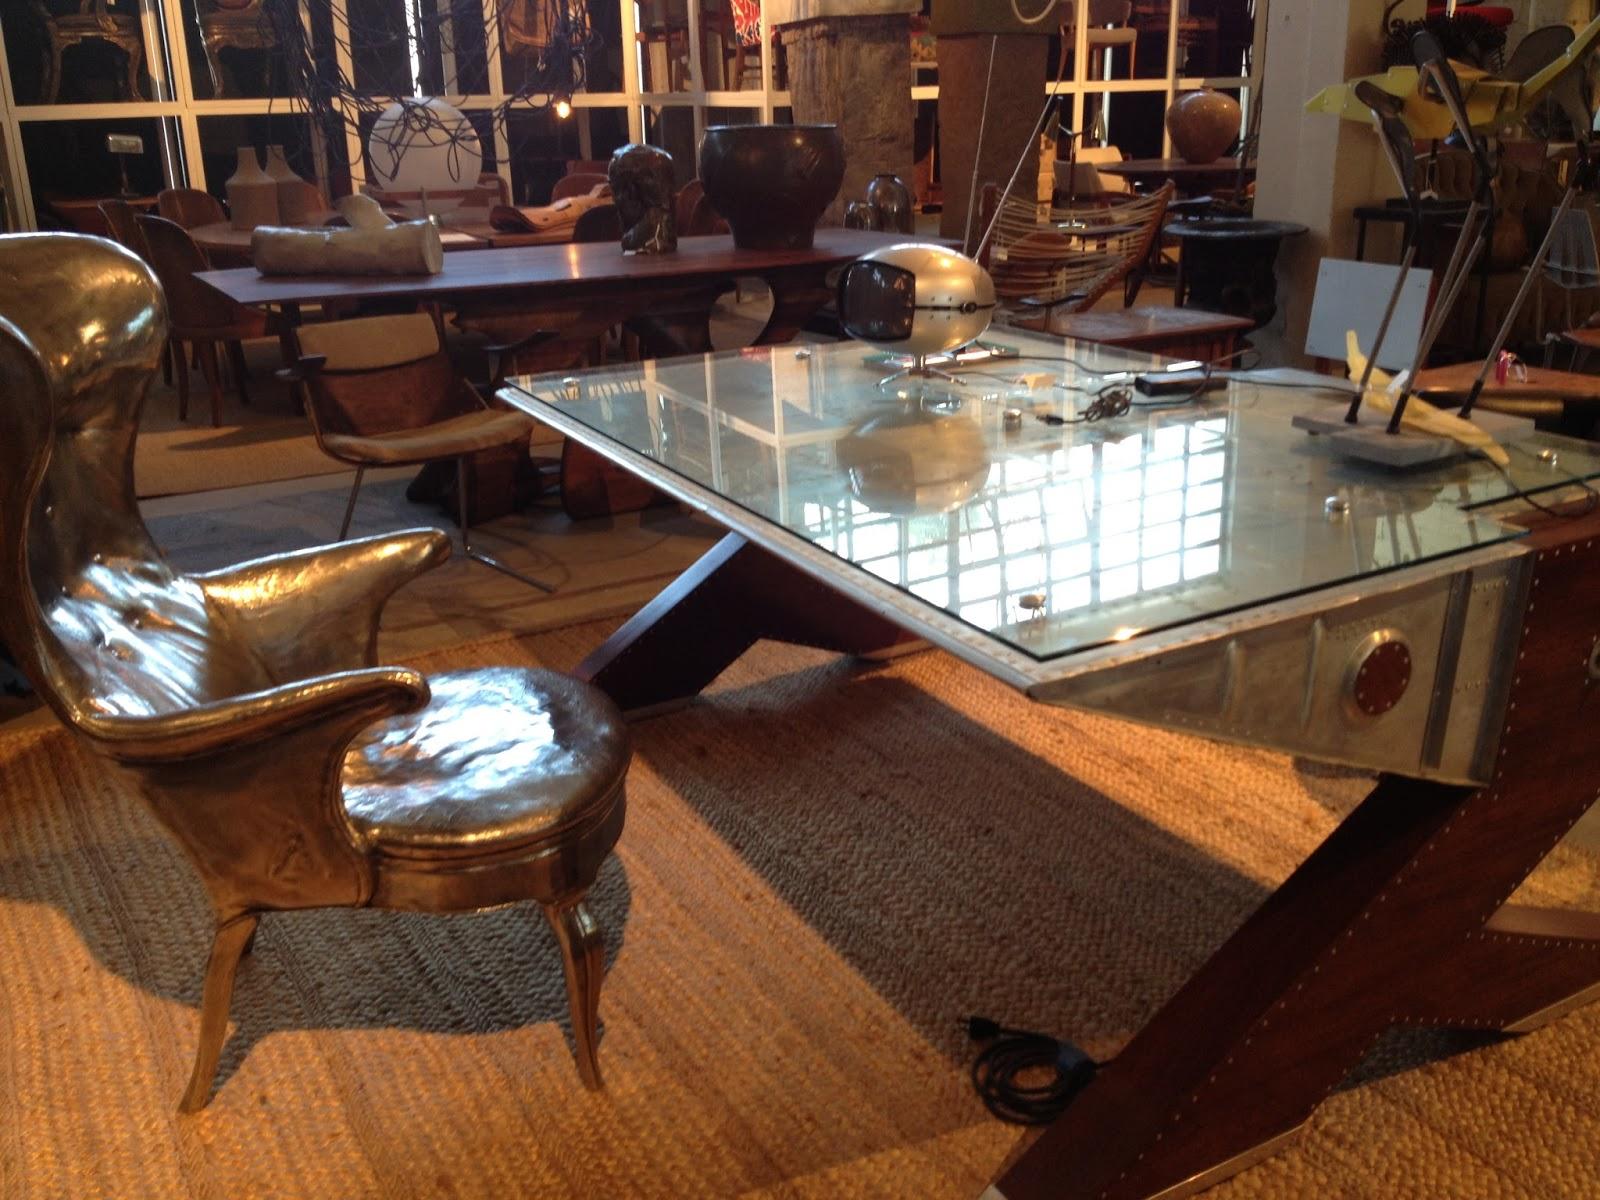 Decor Dreams & Schemes Where do Interior Designers shop